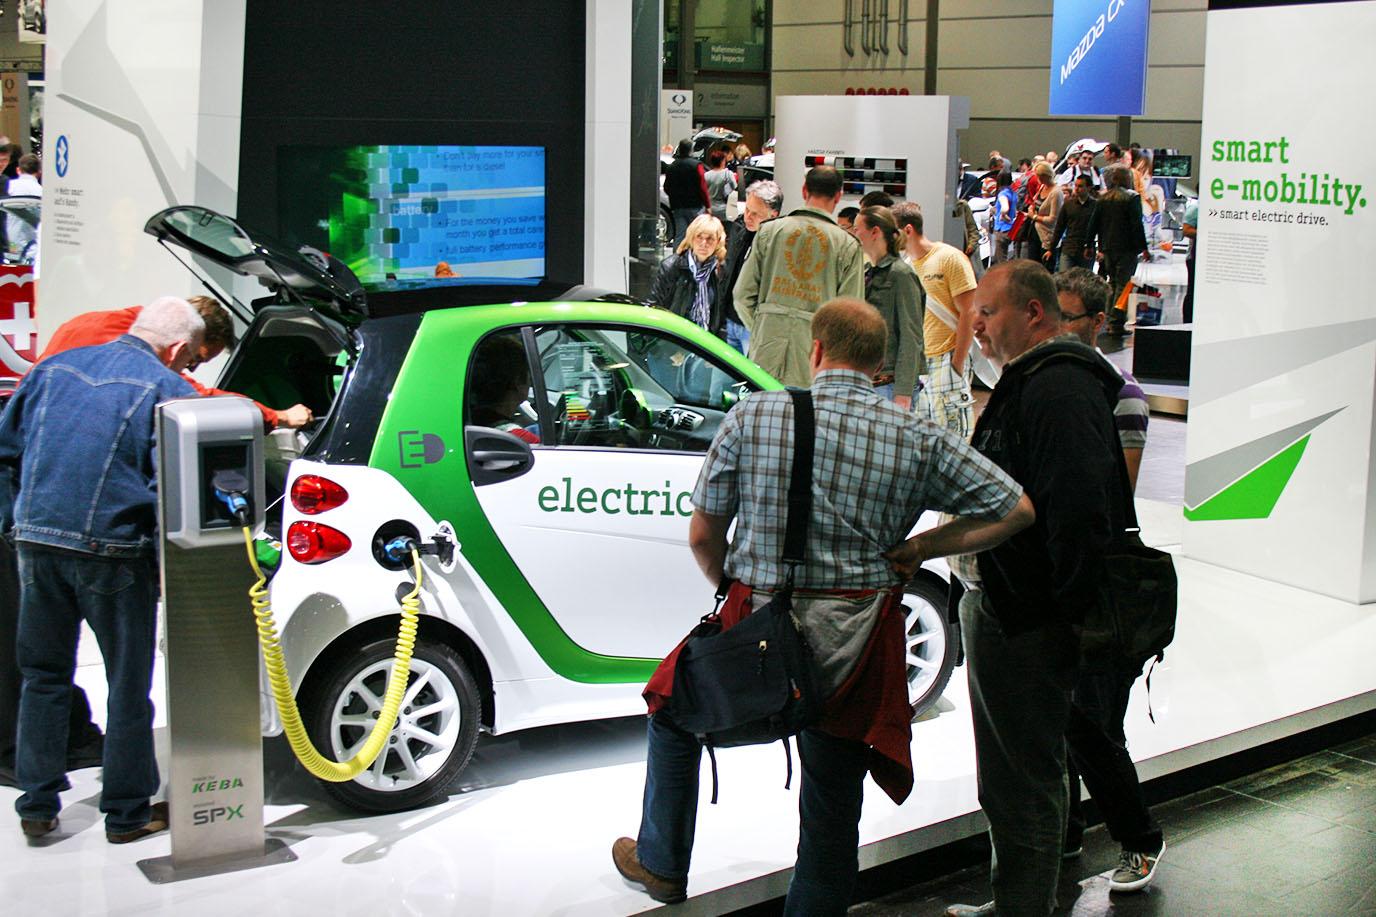 schareinprojekt-event-smart-team-messe-fair-auto-elektro-hostess-frankfurt